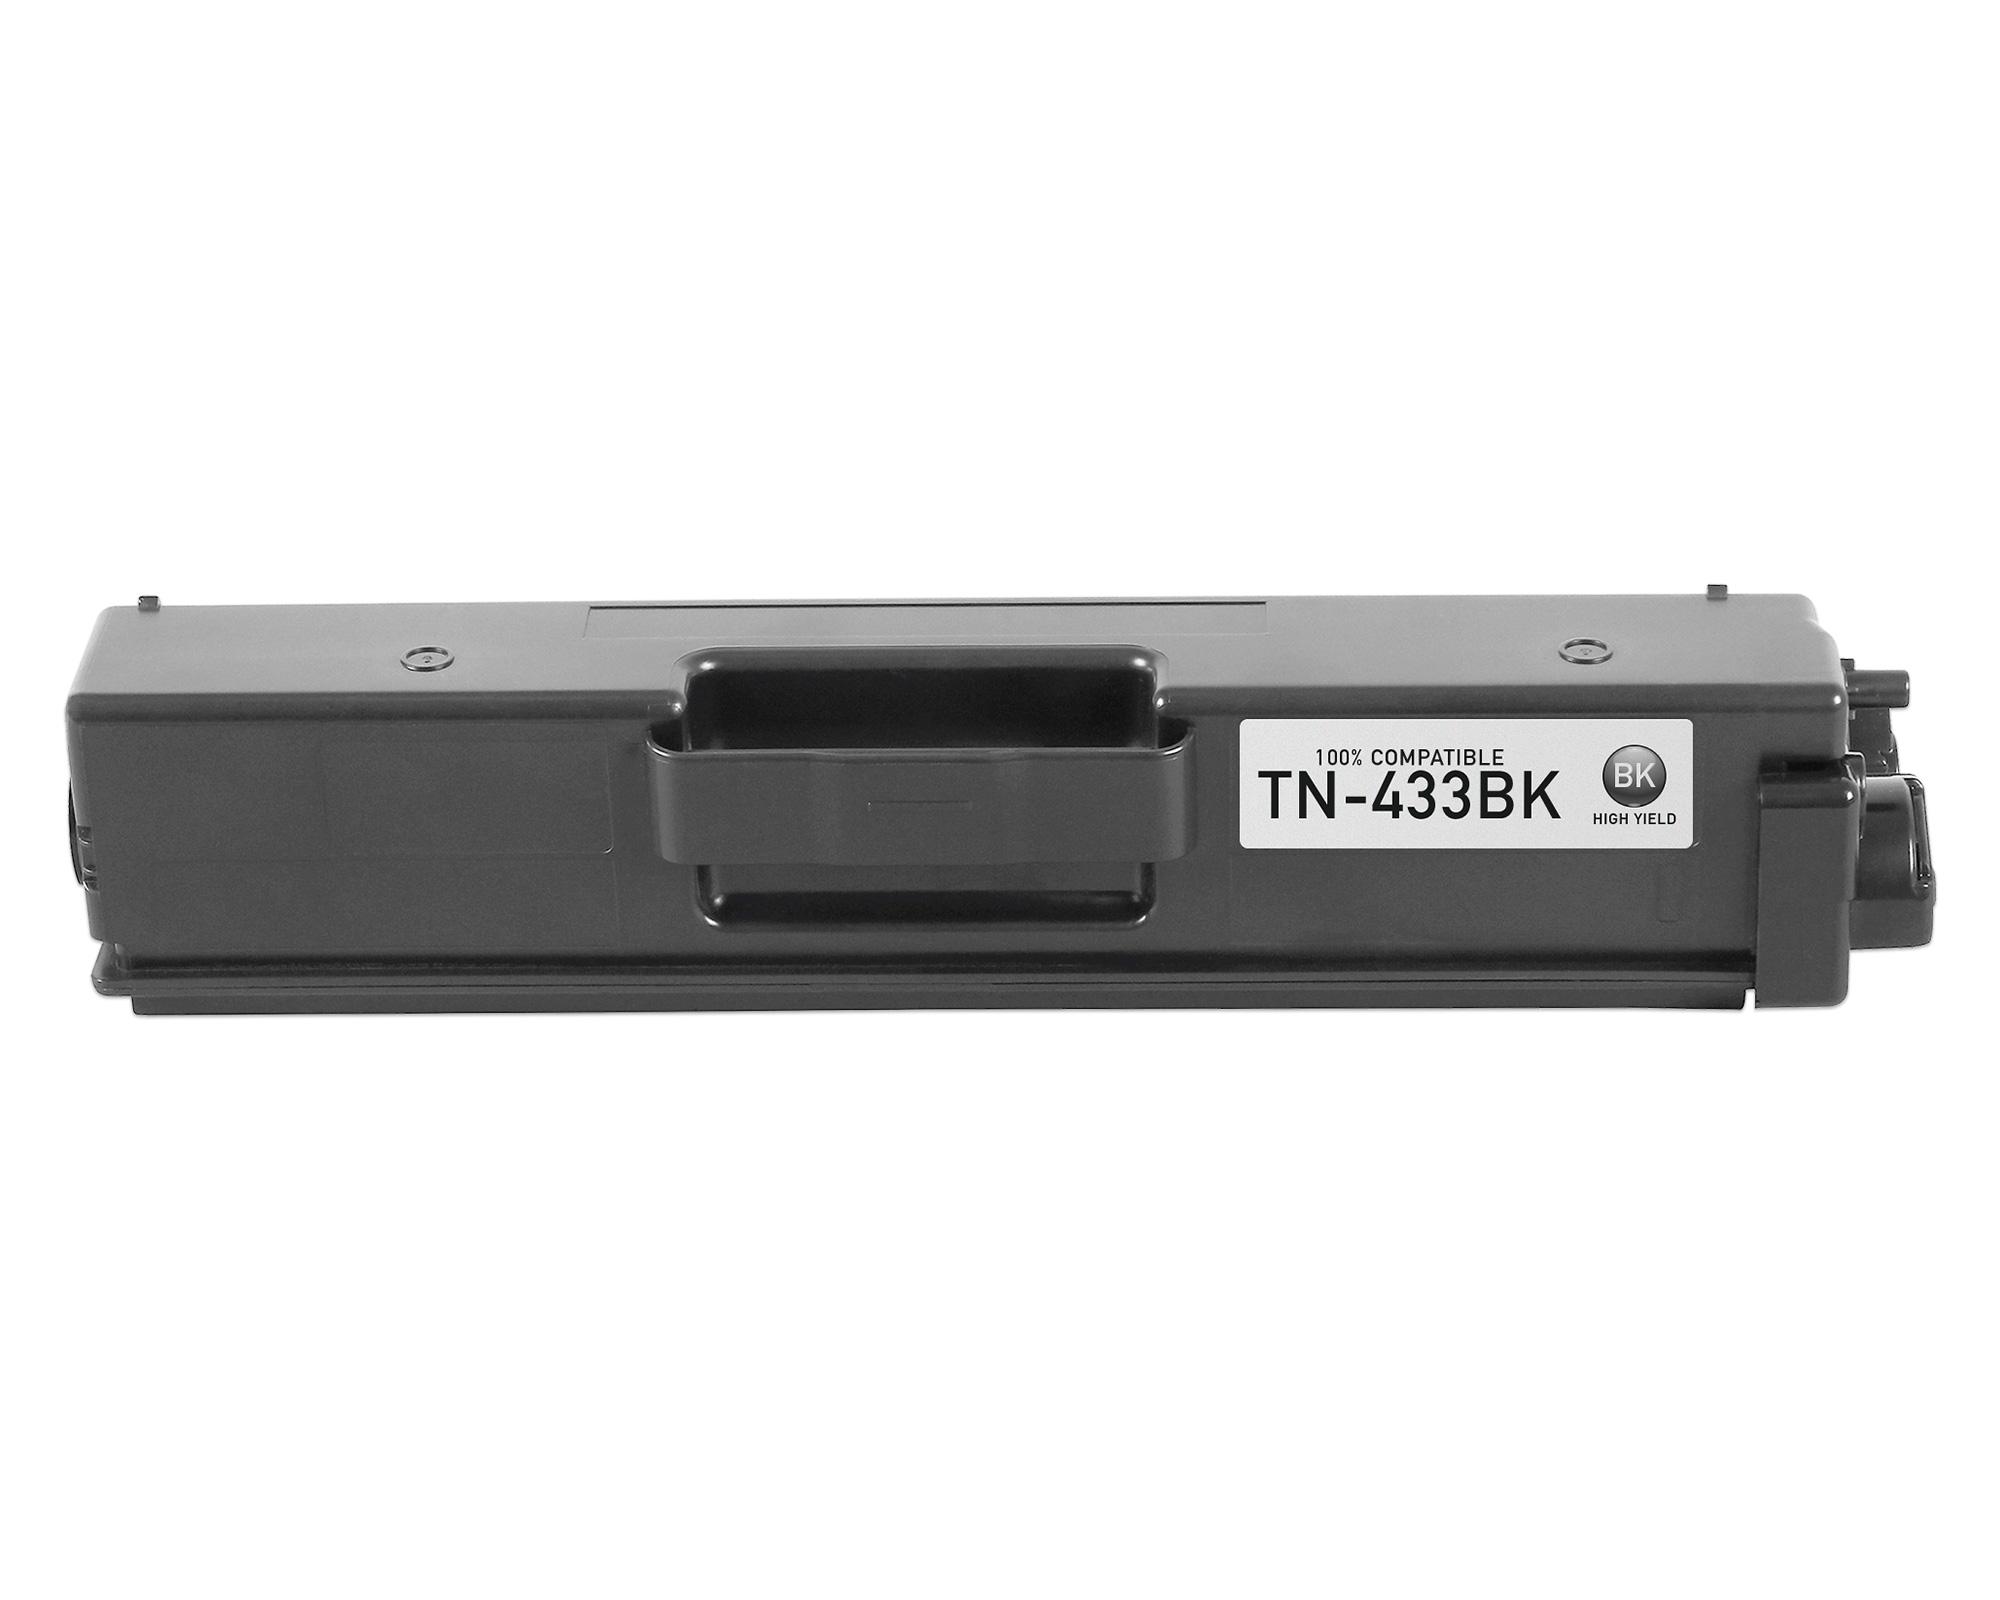 Brother MFC-L8900CDW Black Toner Cartridge - 4,500 Pages -  Generic Toner, Black-Toner-Cartridge-High-Yield-Brother-MFC-L8900